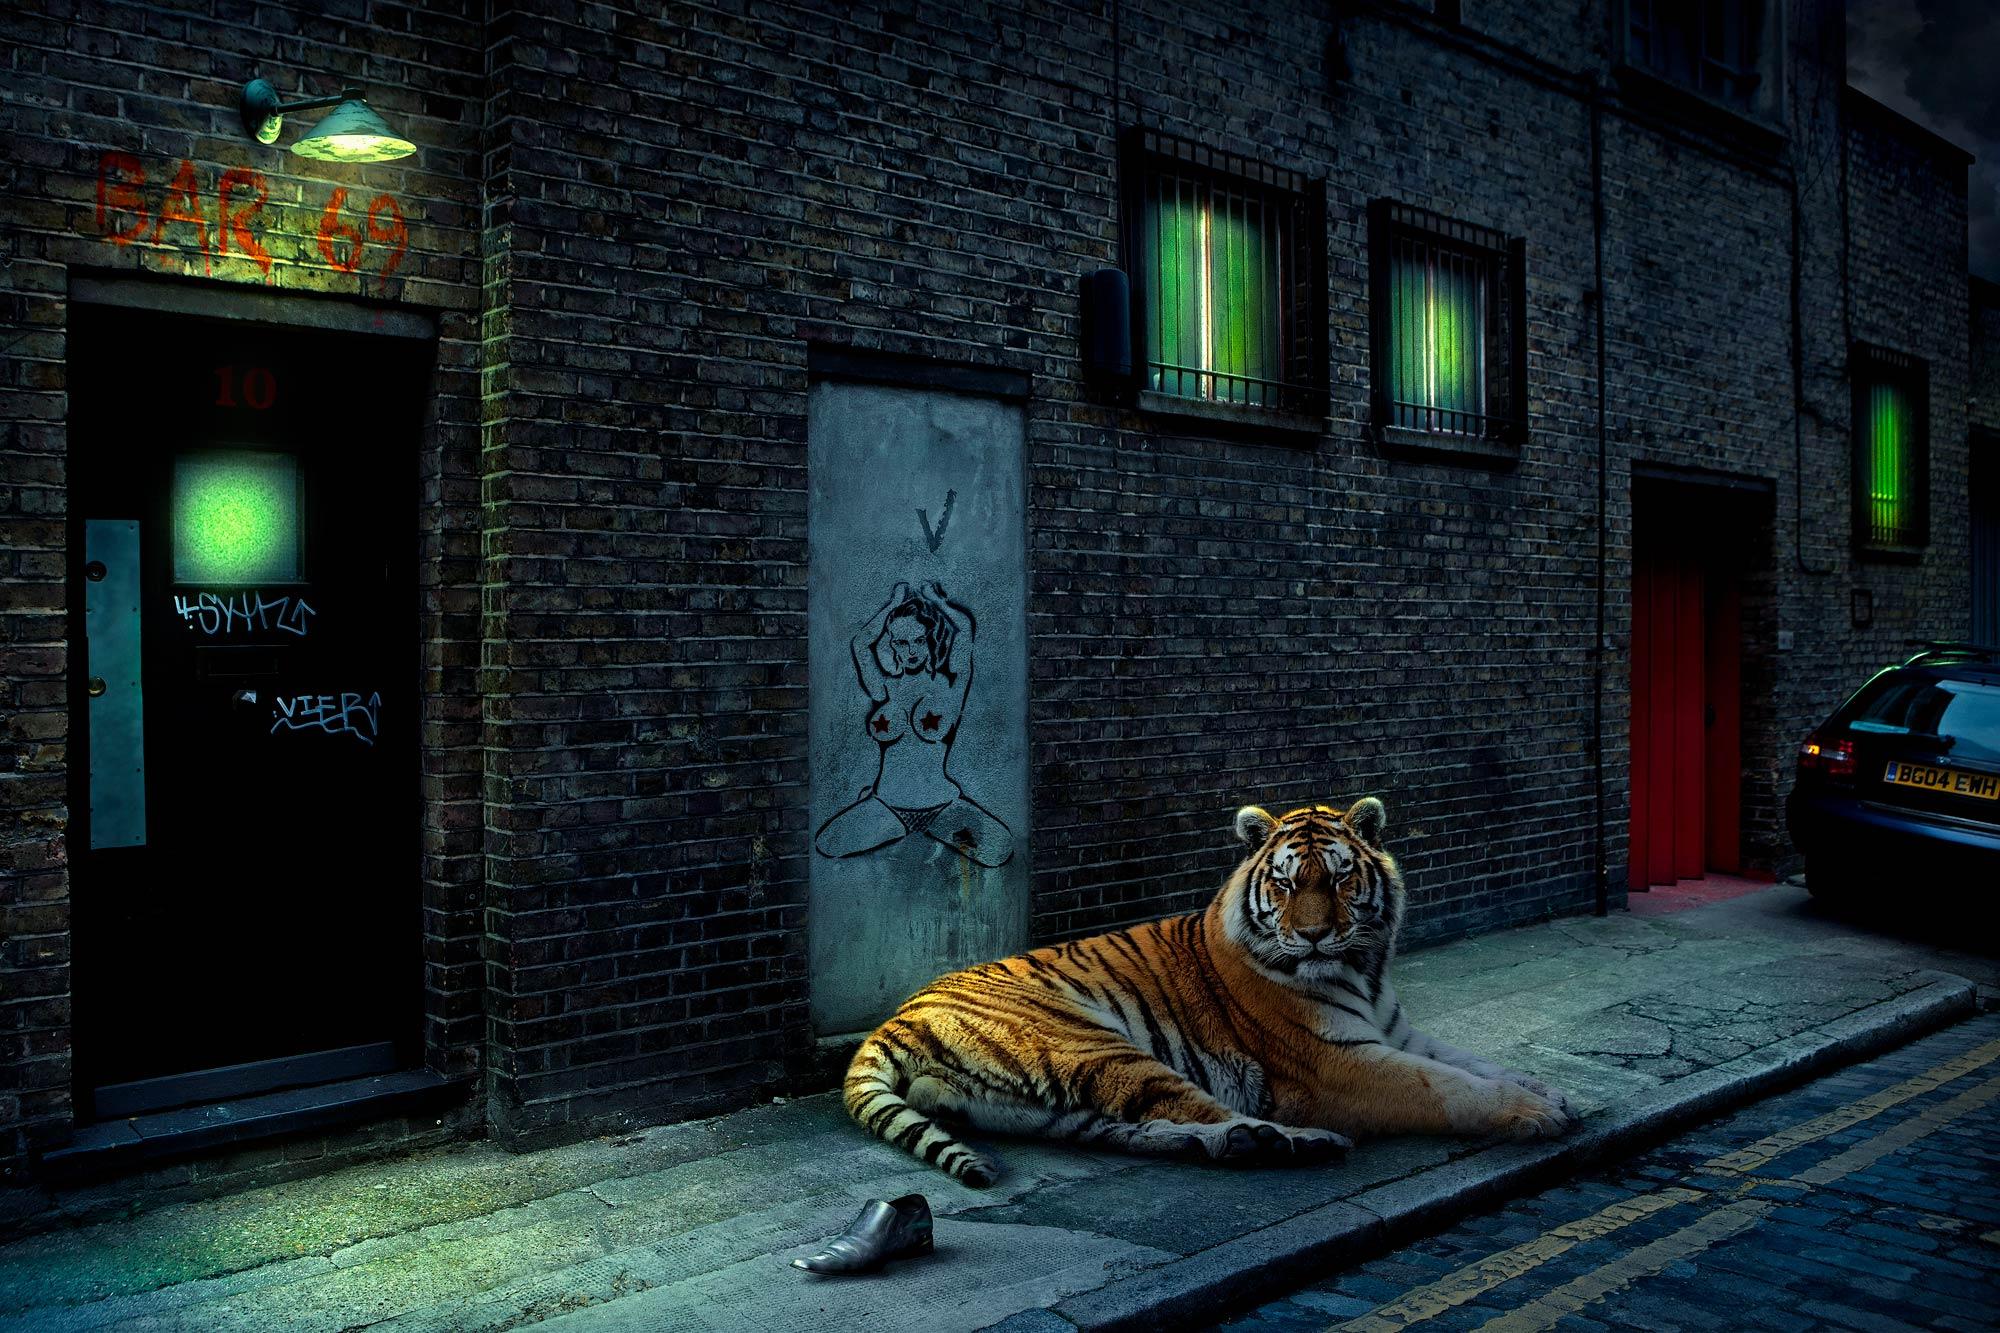 Chris Clor Tiger outside club